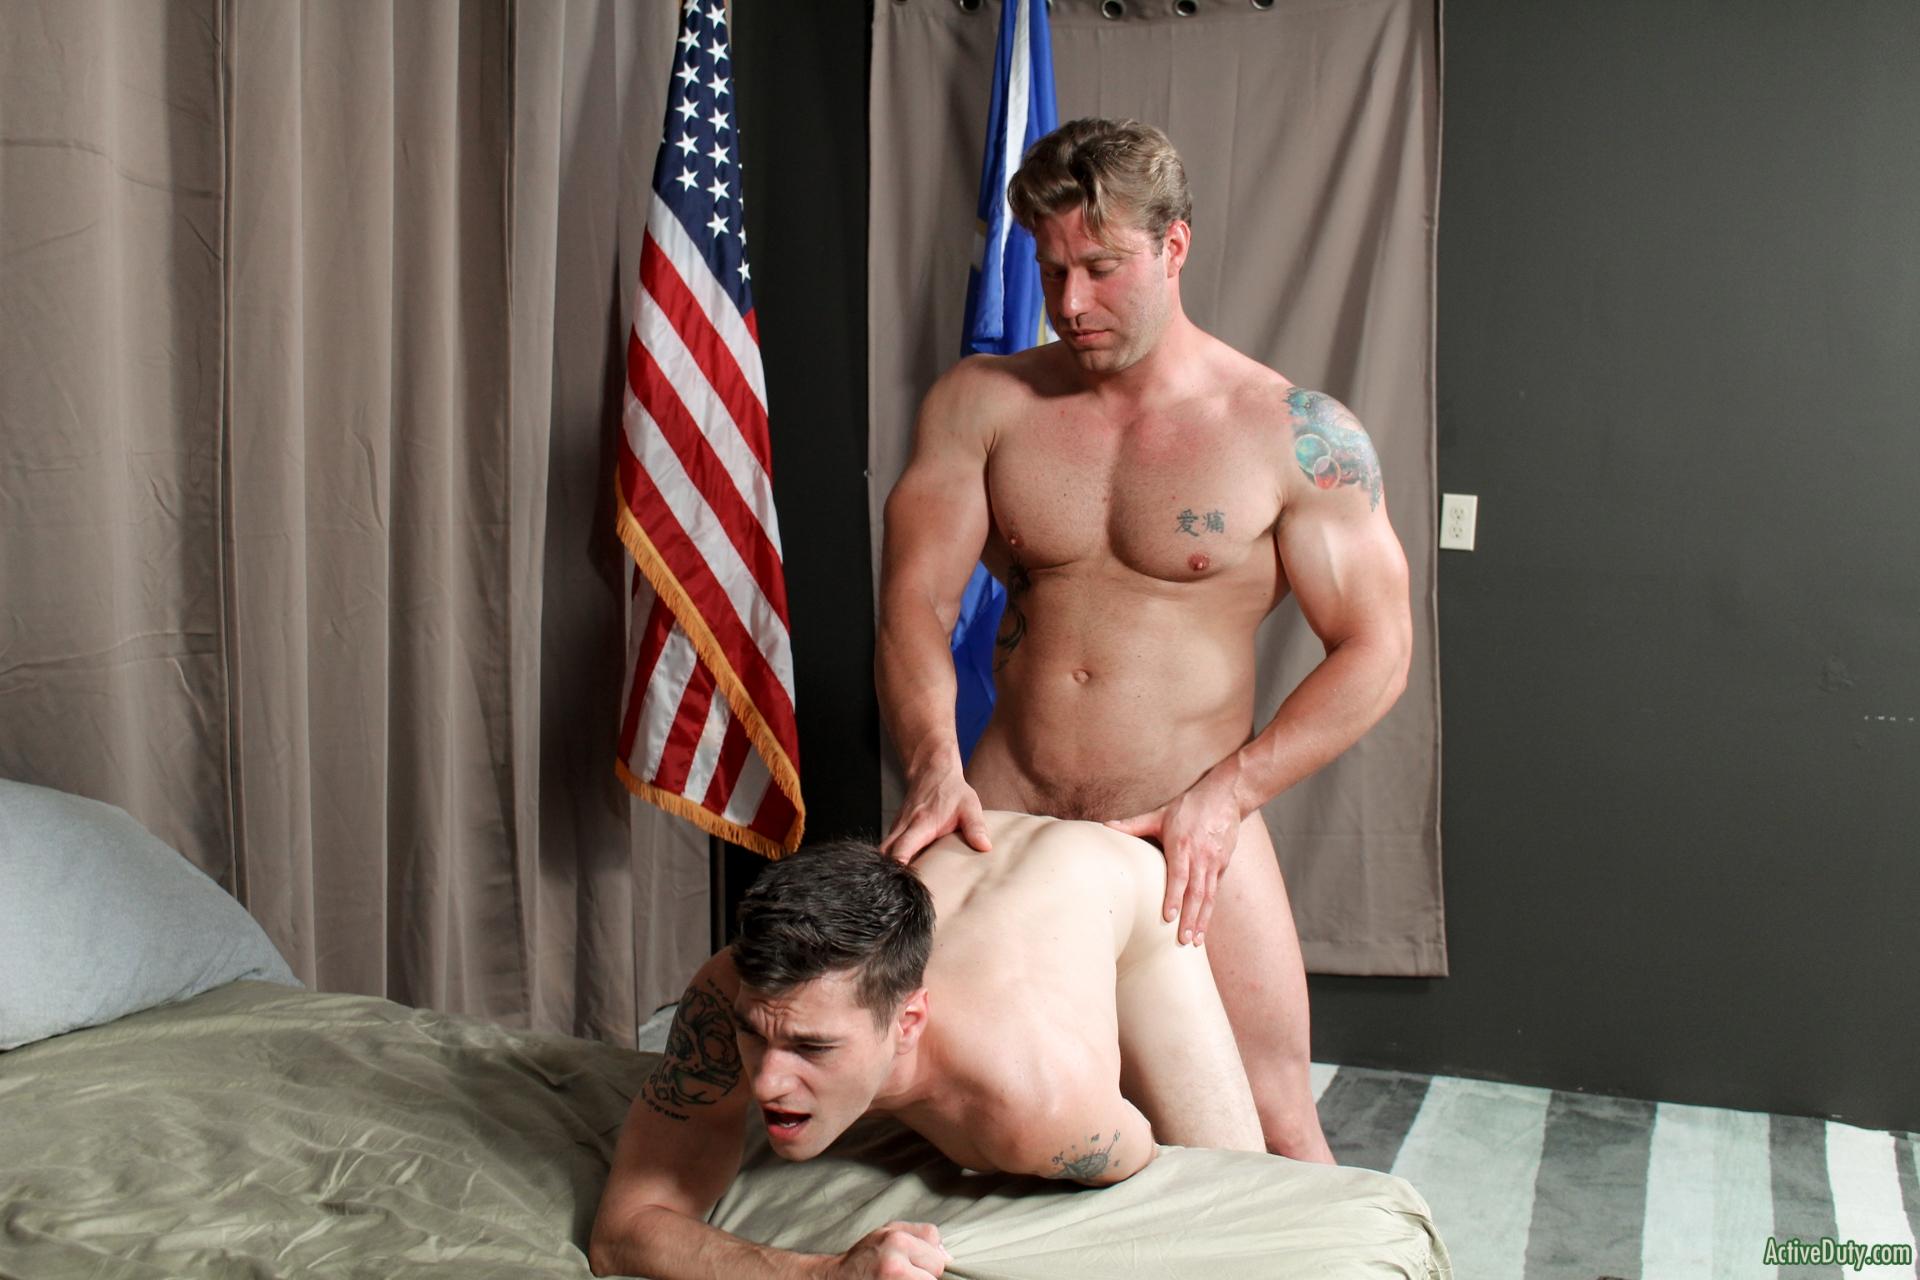 john hawkins gay porn active duty princeton price